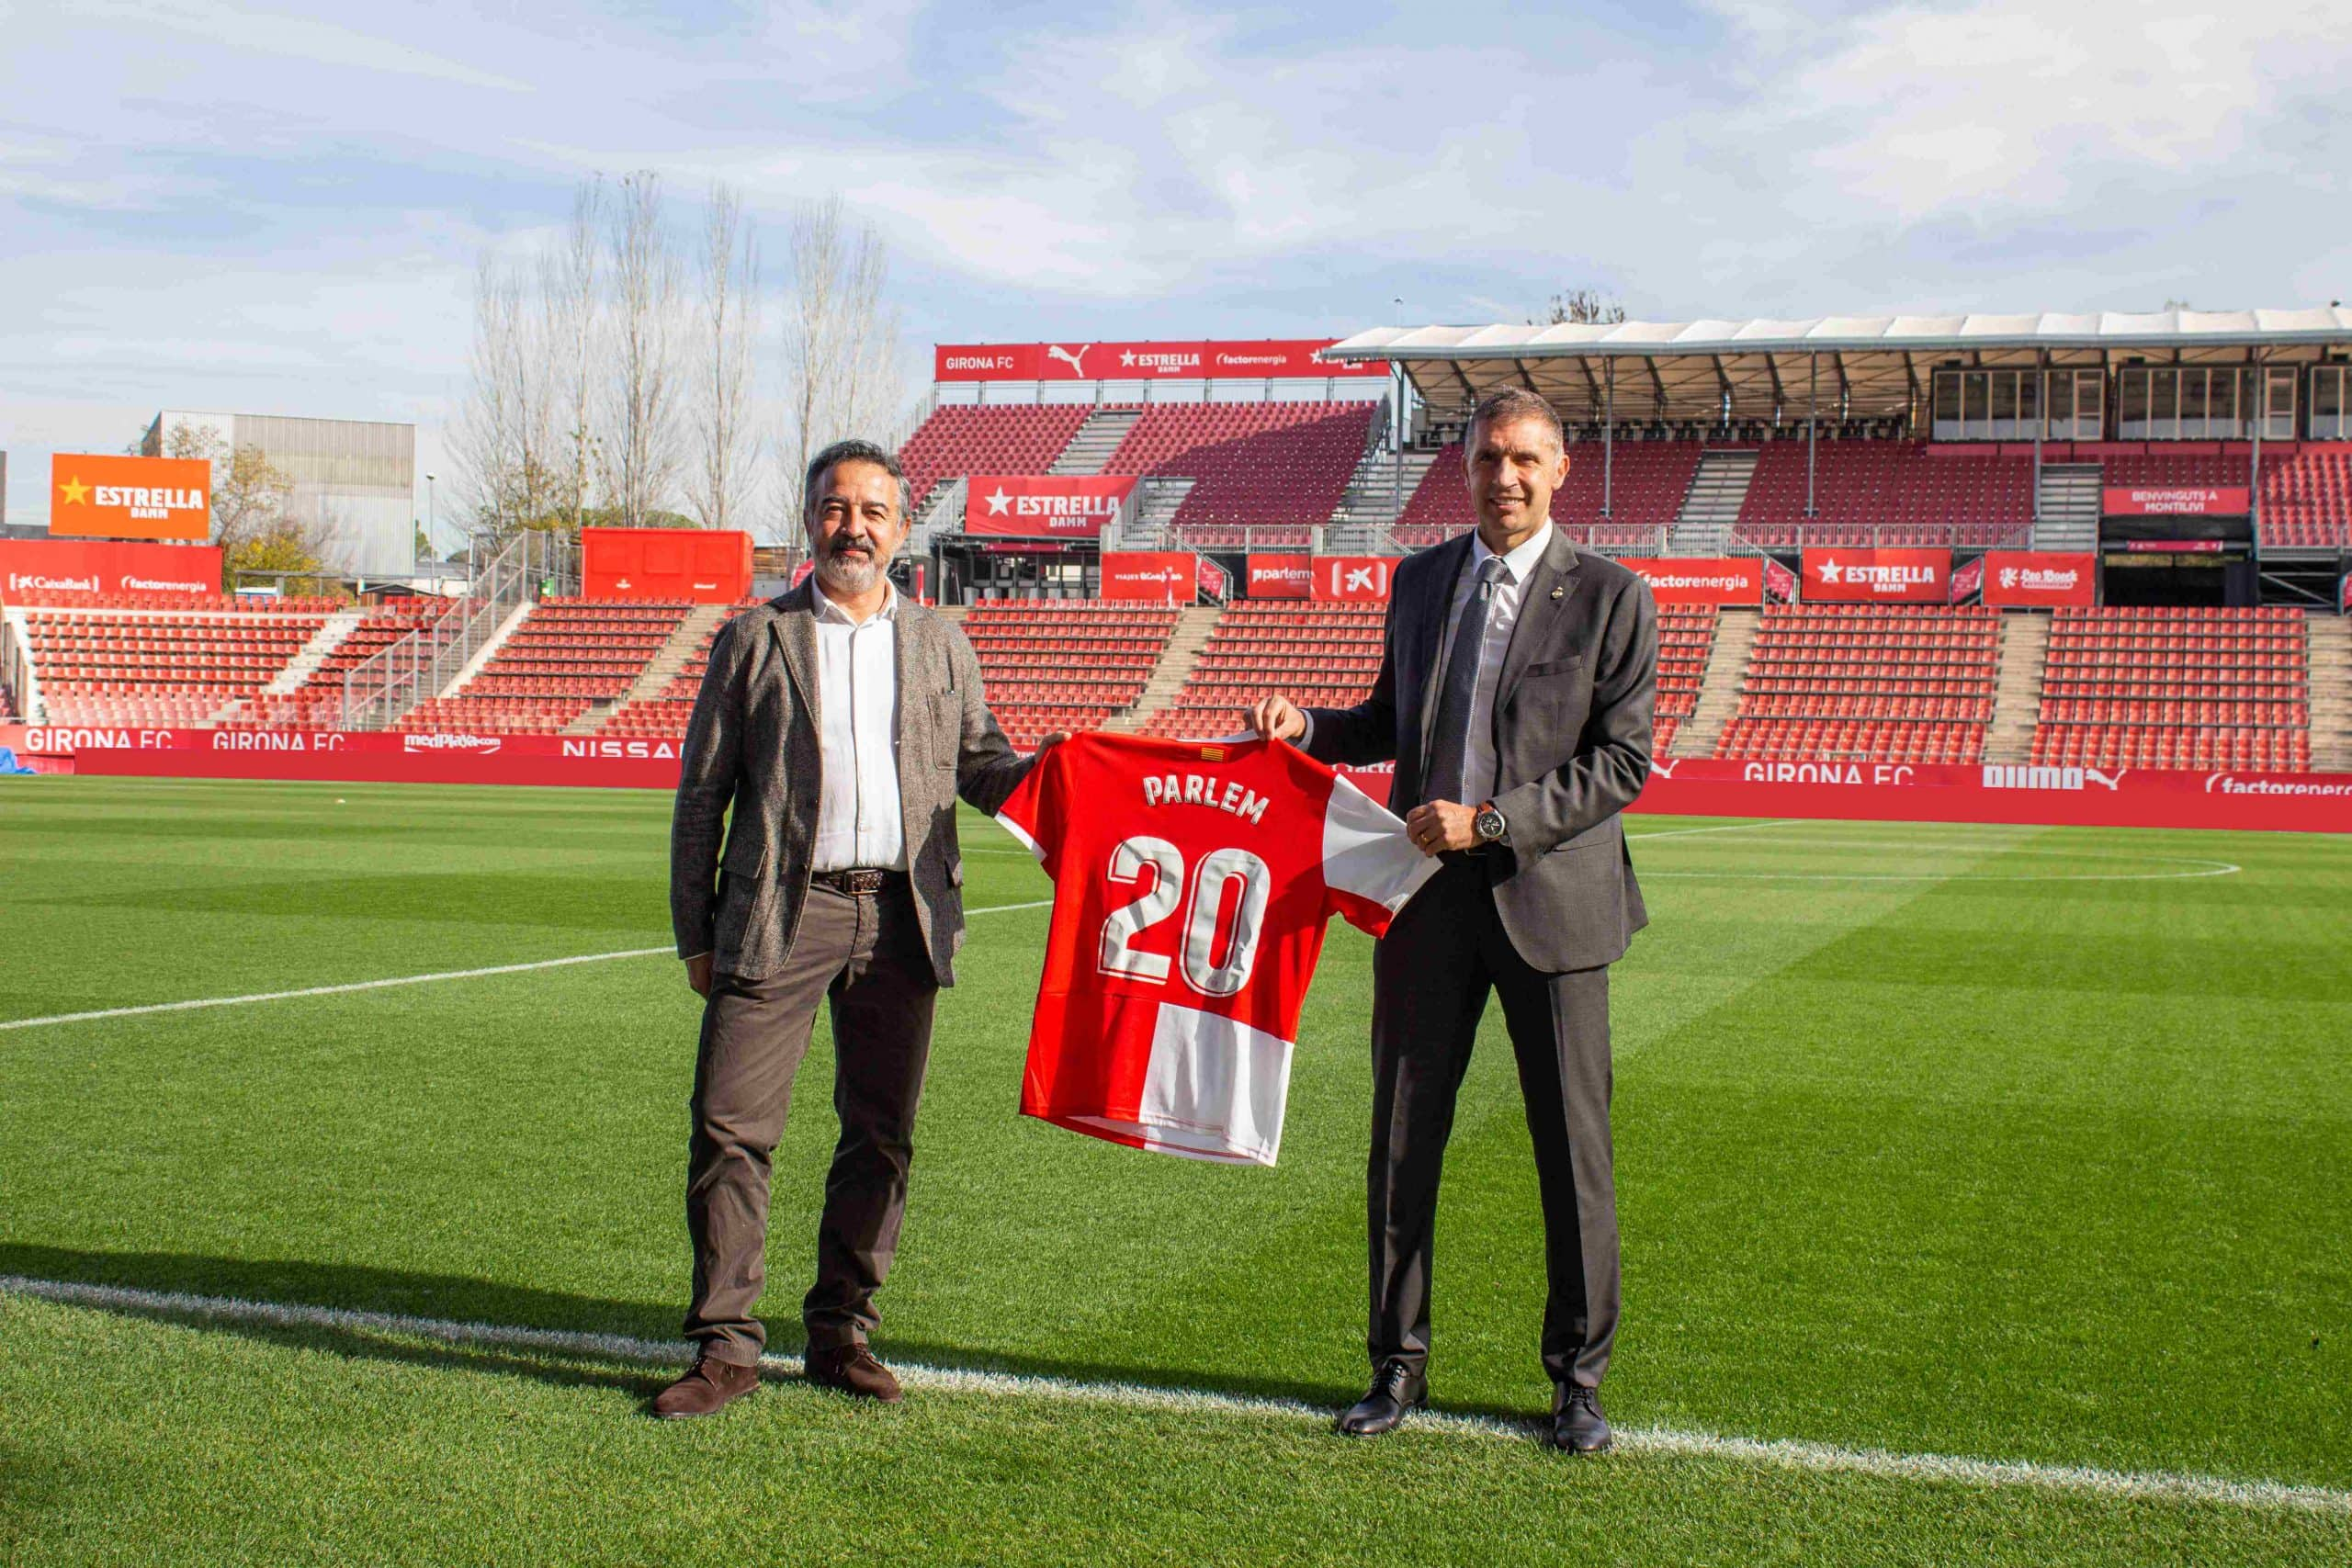 Girona FC i Parlem